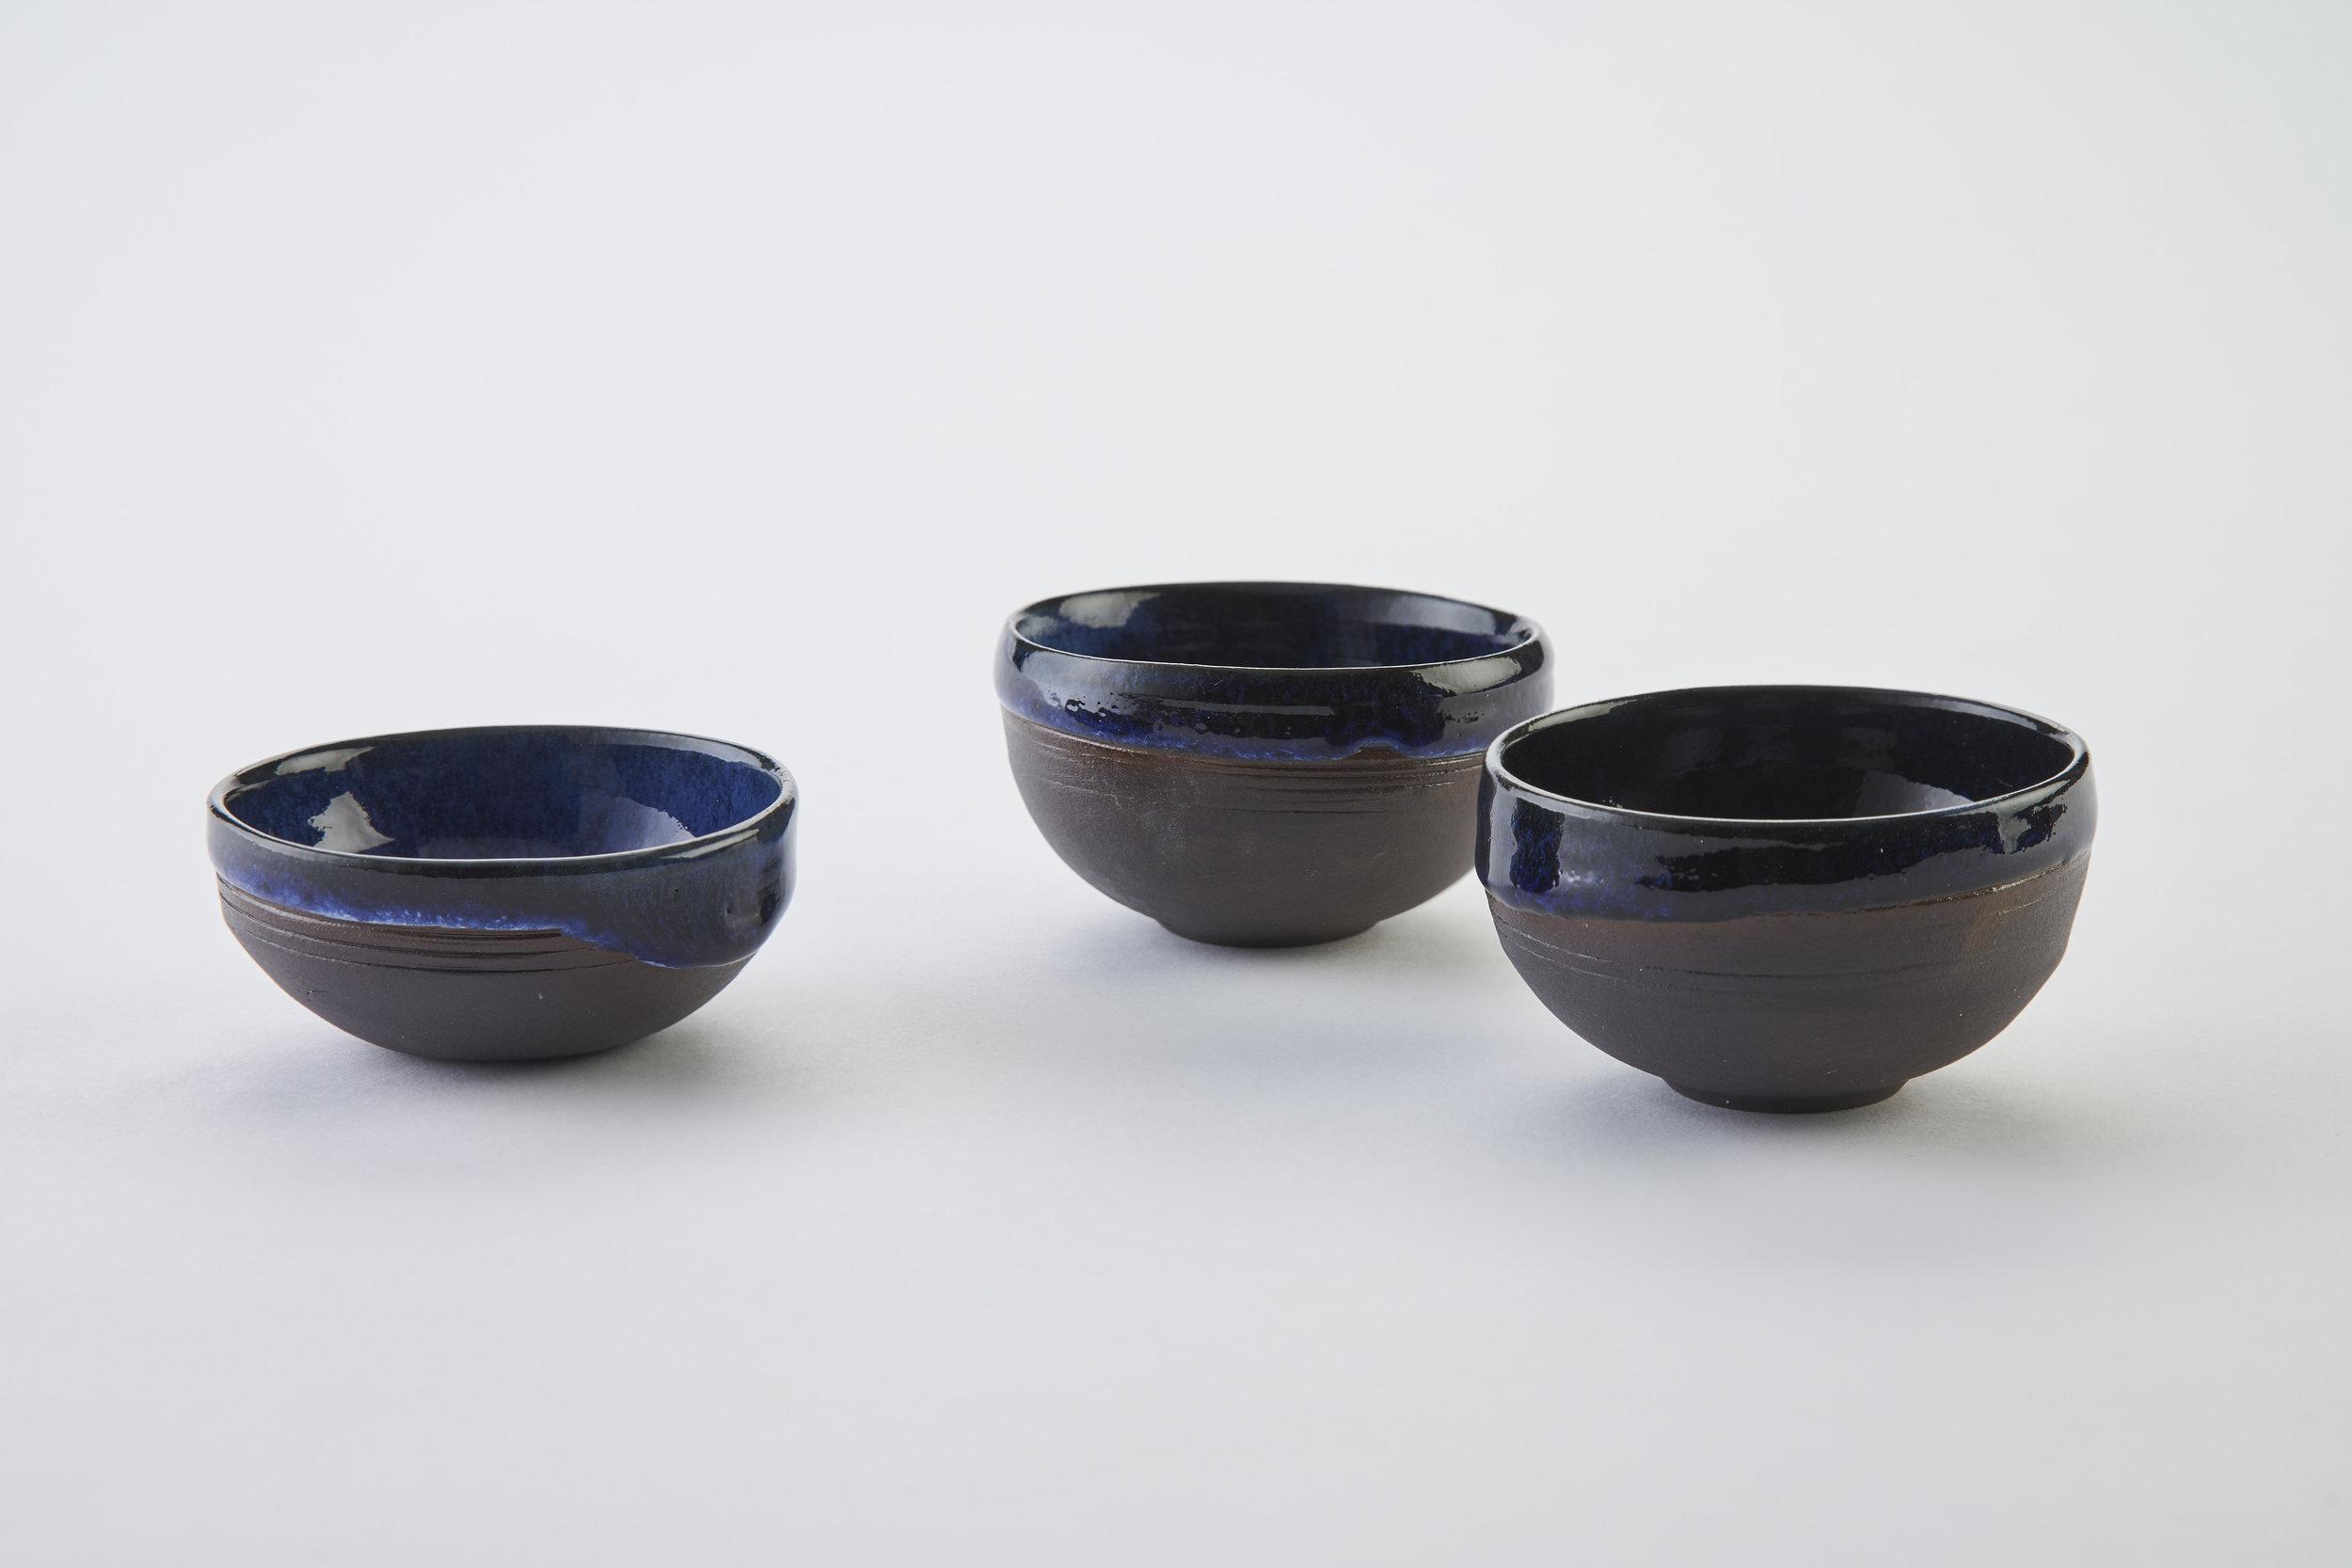 KA Ceramics Black Onyx porcelain salt bowls (7.5cm x 4cm) and chilli bowls (3cm x 7cm) cobalt blue, dolomte and tin layered glaze. Matthew Booth photography.jpg